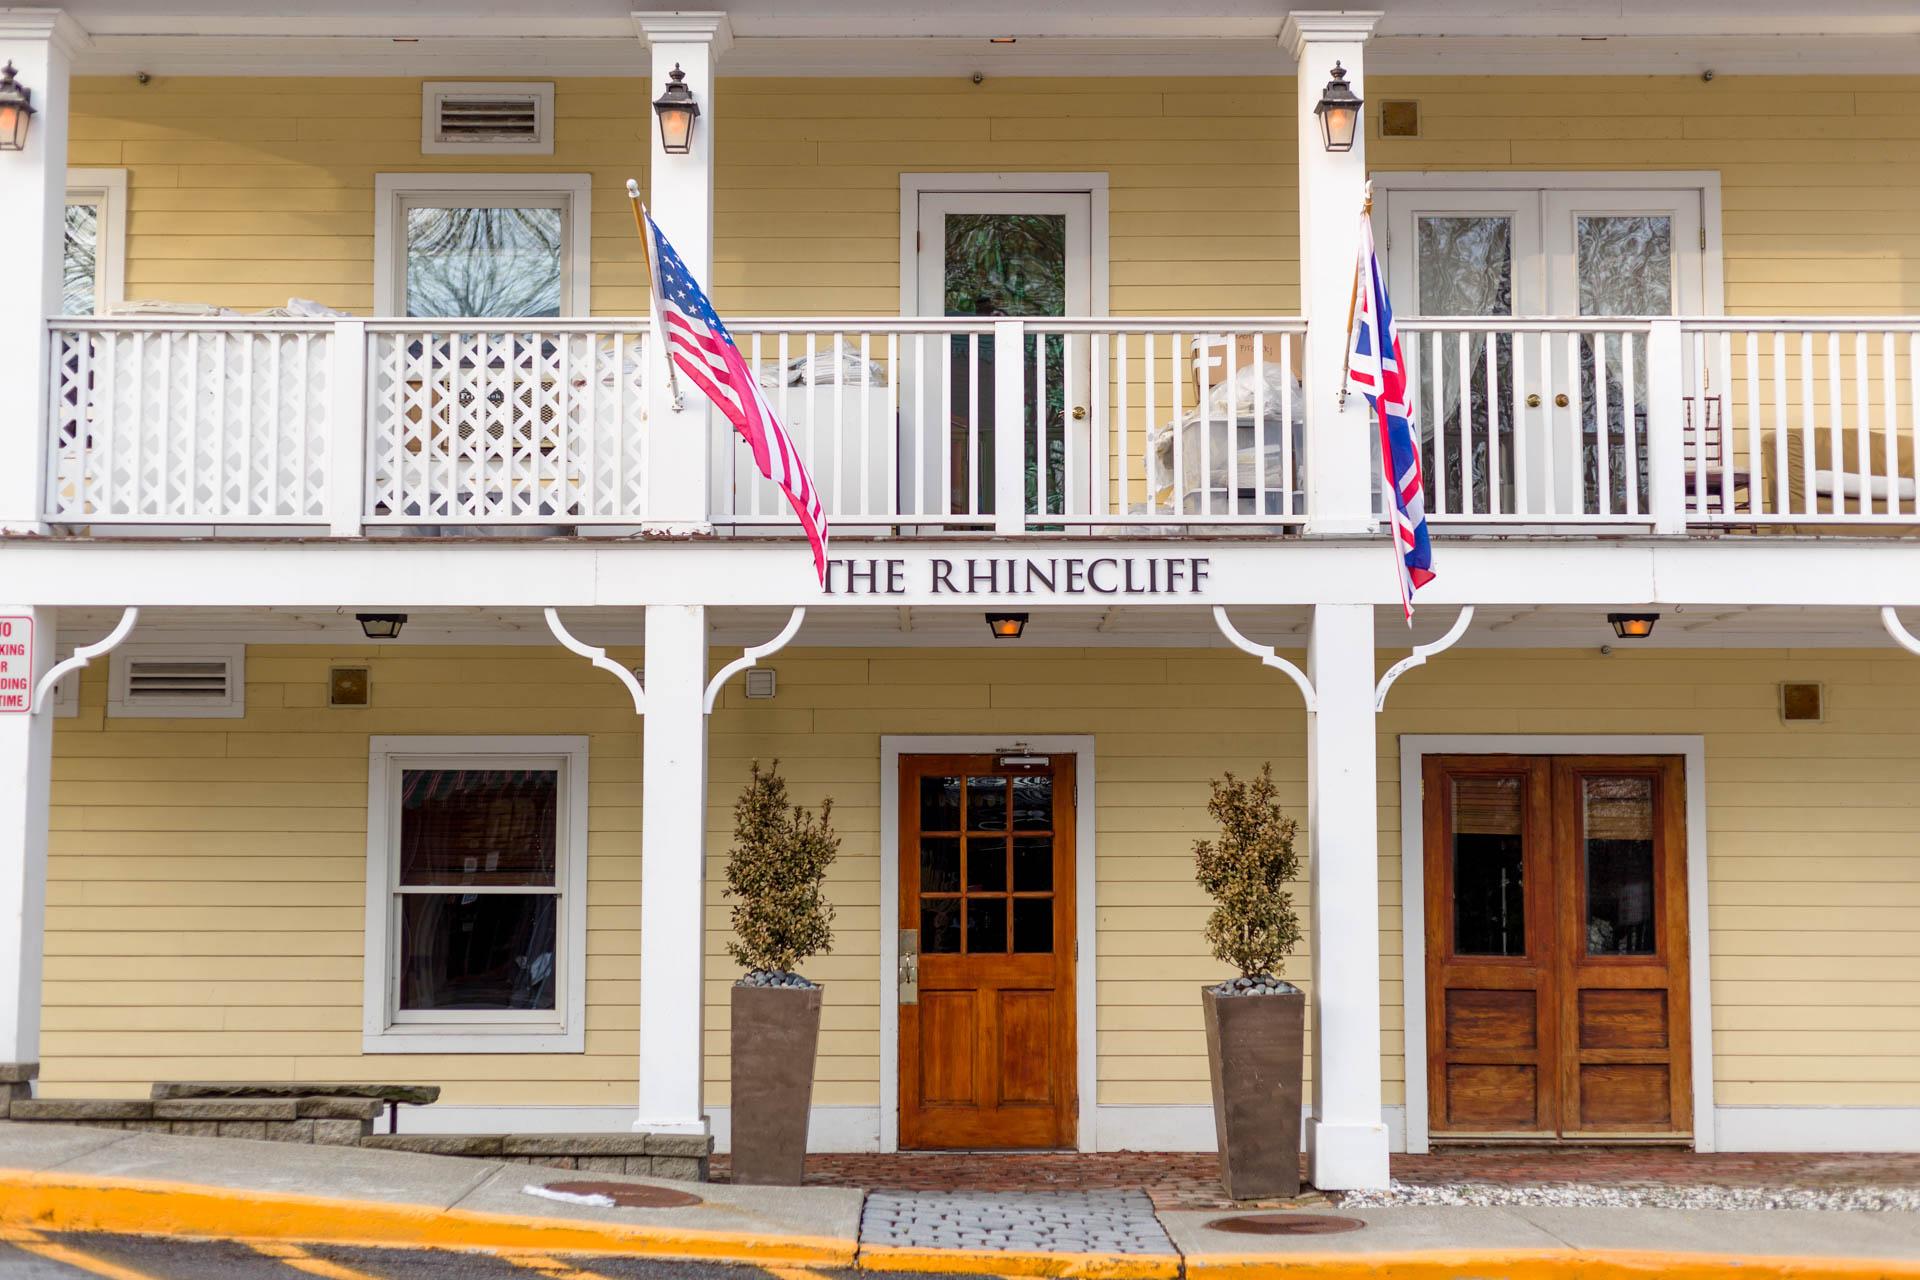 The Rhinecliff Hotel